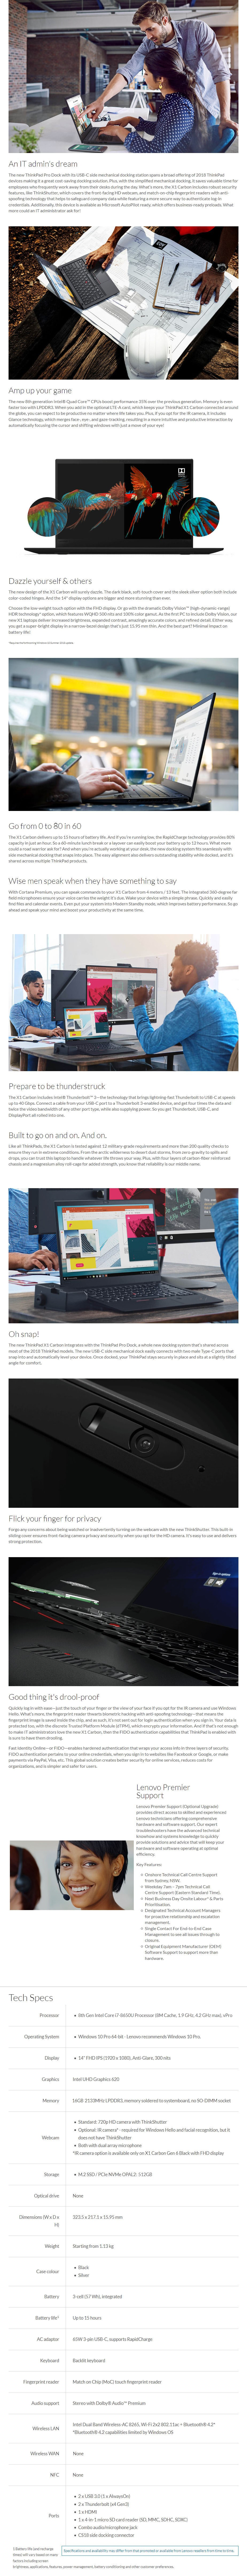 "Lenovo ThinkPad X1 Carbon Gen 6 14"" Notebook i7-8650U vPro 16GB 512GB SSD W10P - Overview 1"